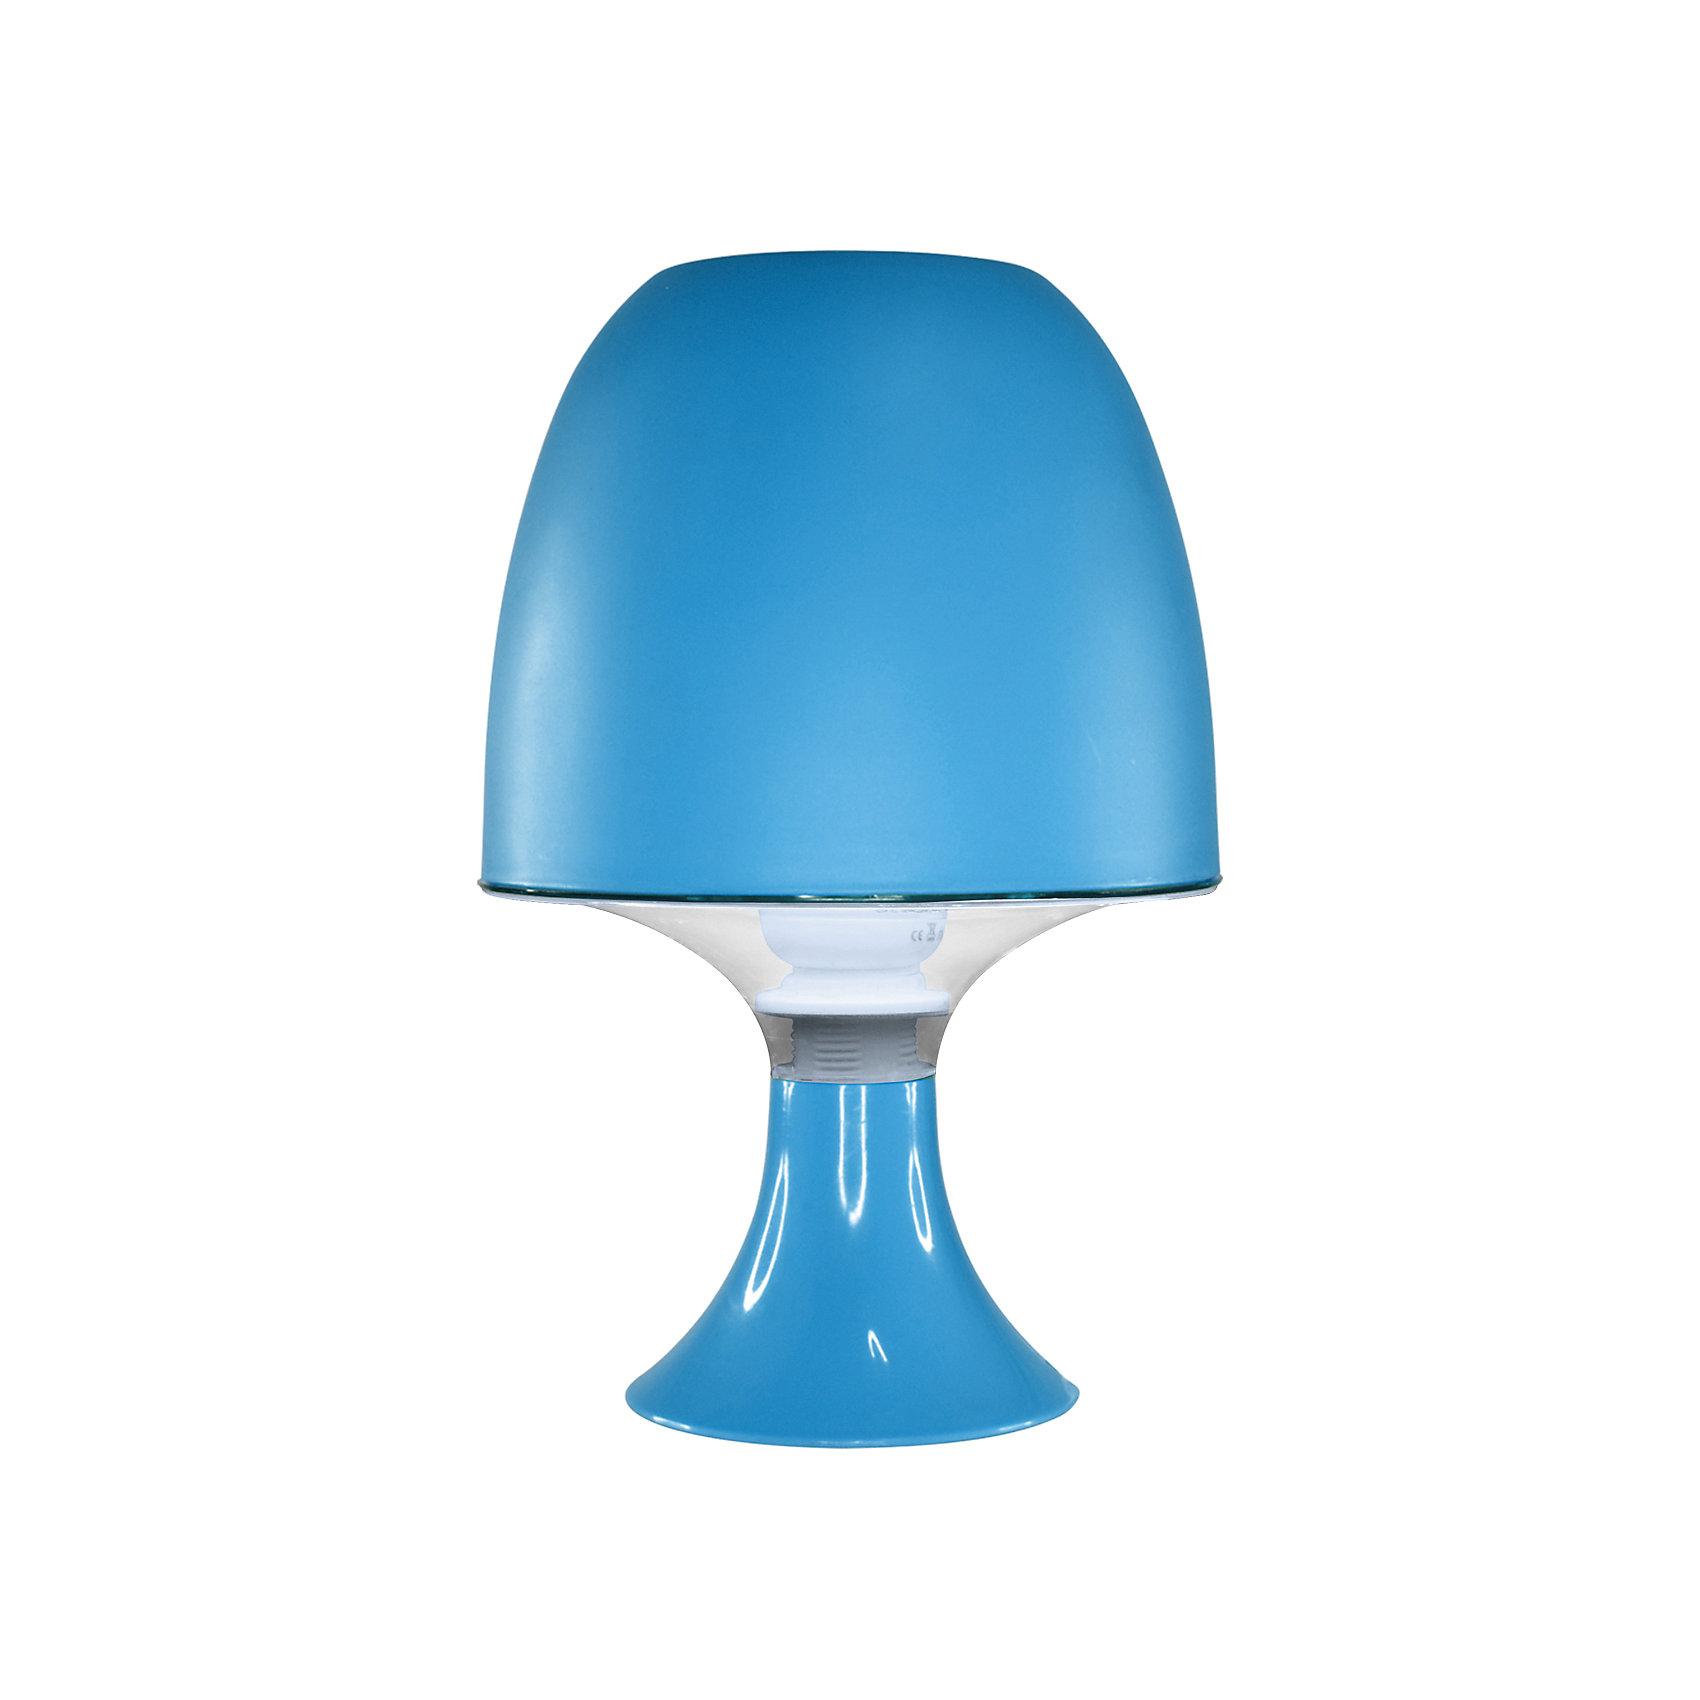 Ultra Light Настольный ночник КЛЛ 15Вт, Ultra Light, голубой